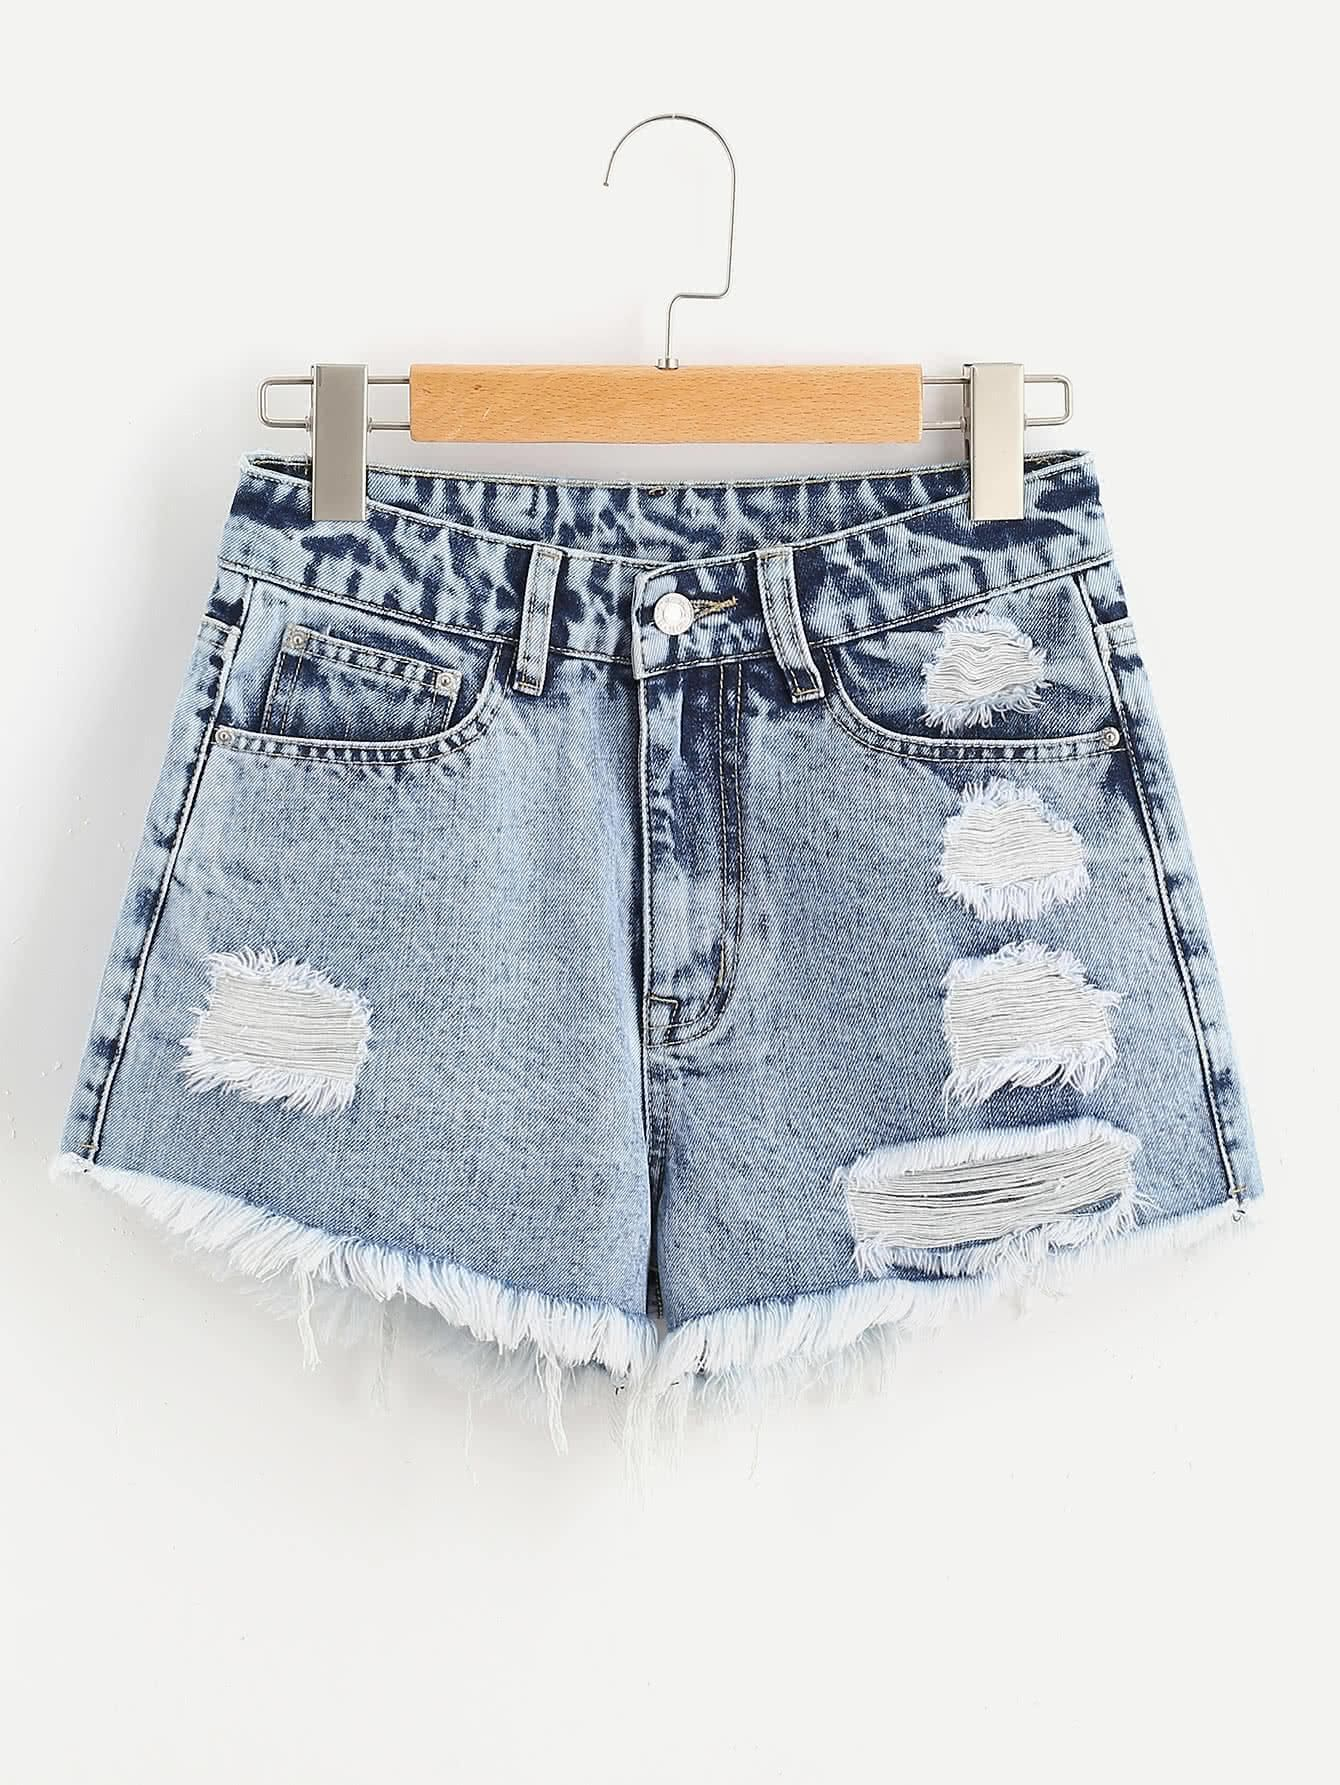 a5034aa957 SheIn - SheIn Cloud Wash Ripped Frayed Hem Denim Shorts - AdoreWe.com